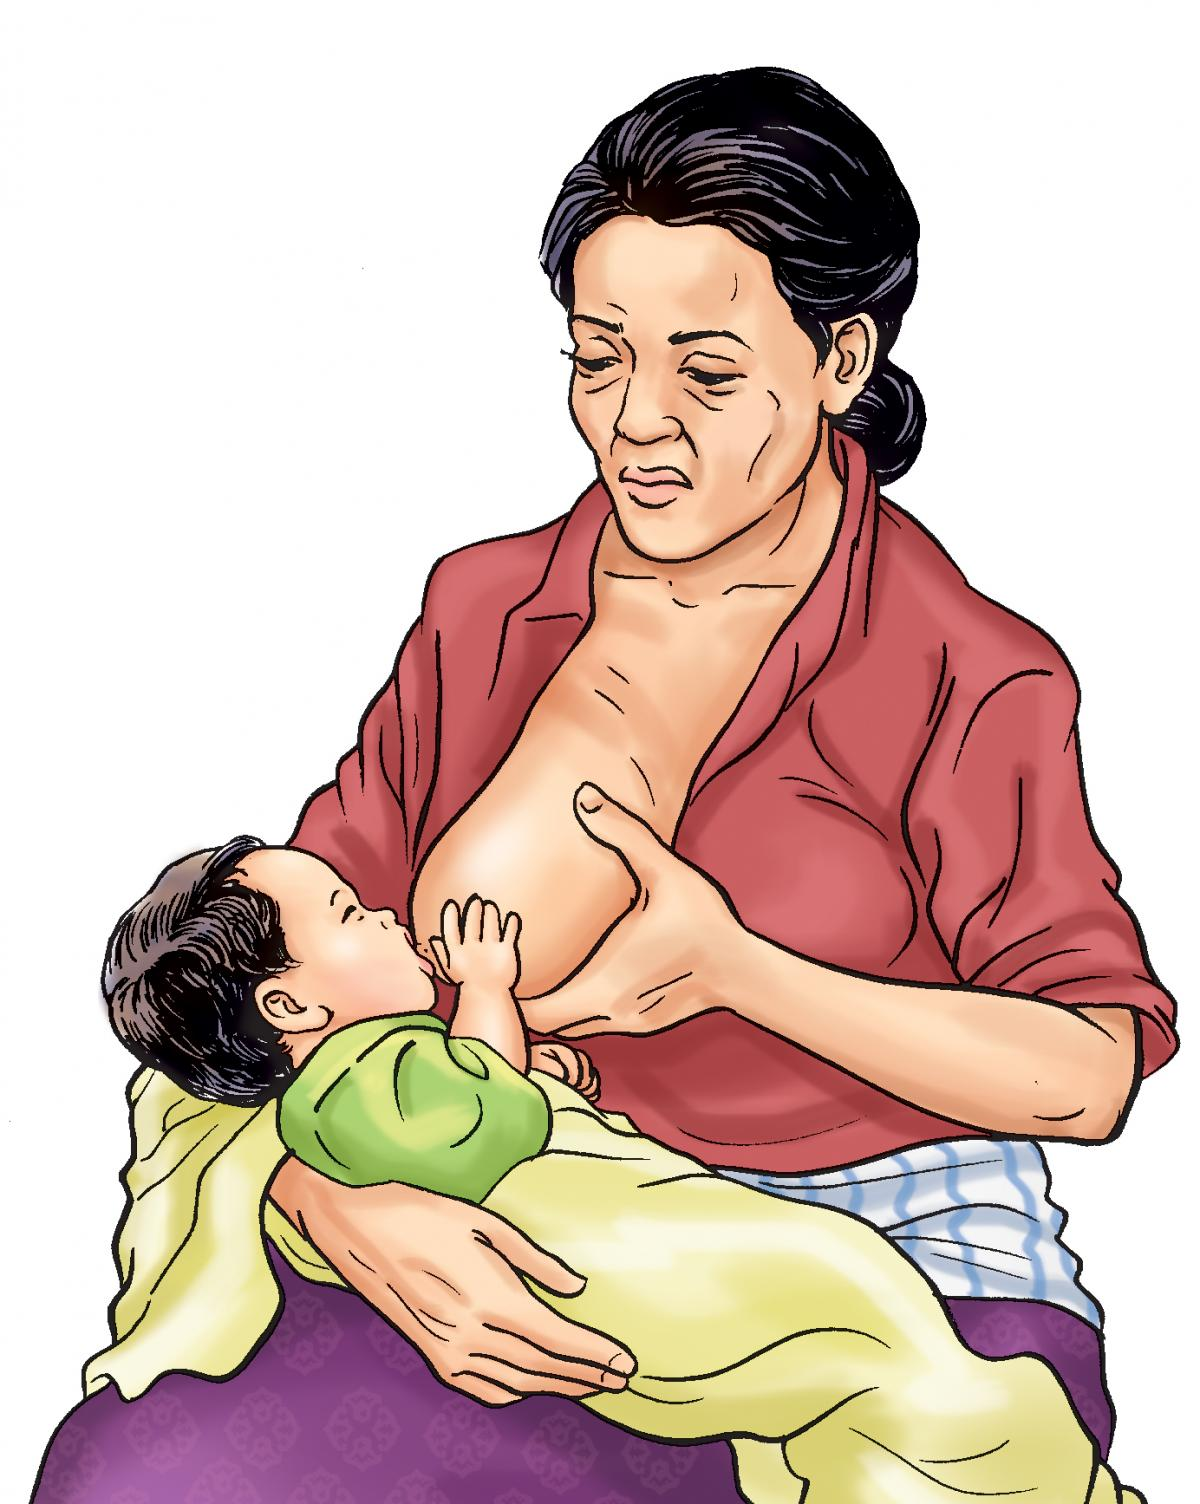 Breastfeeding - Malnourished mother breastfeeding - 02 - Nepal